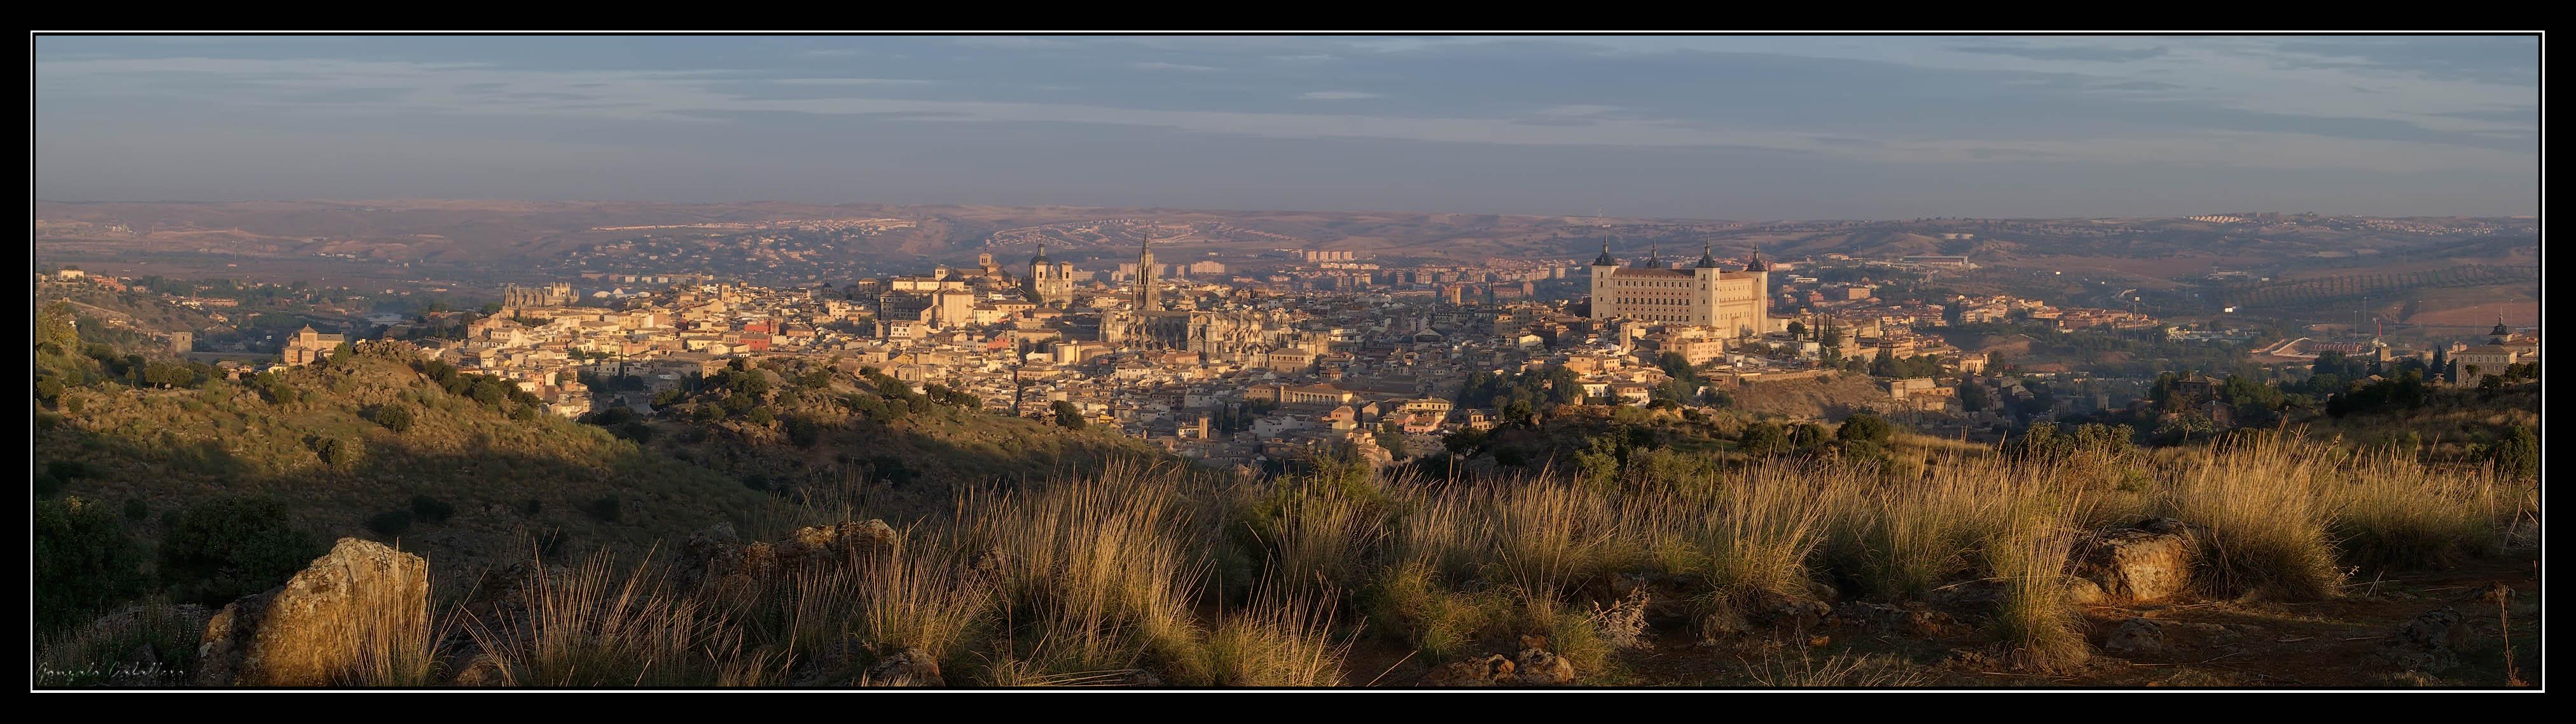 Amanece sobre Toledo (IV)